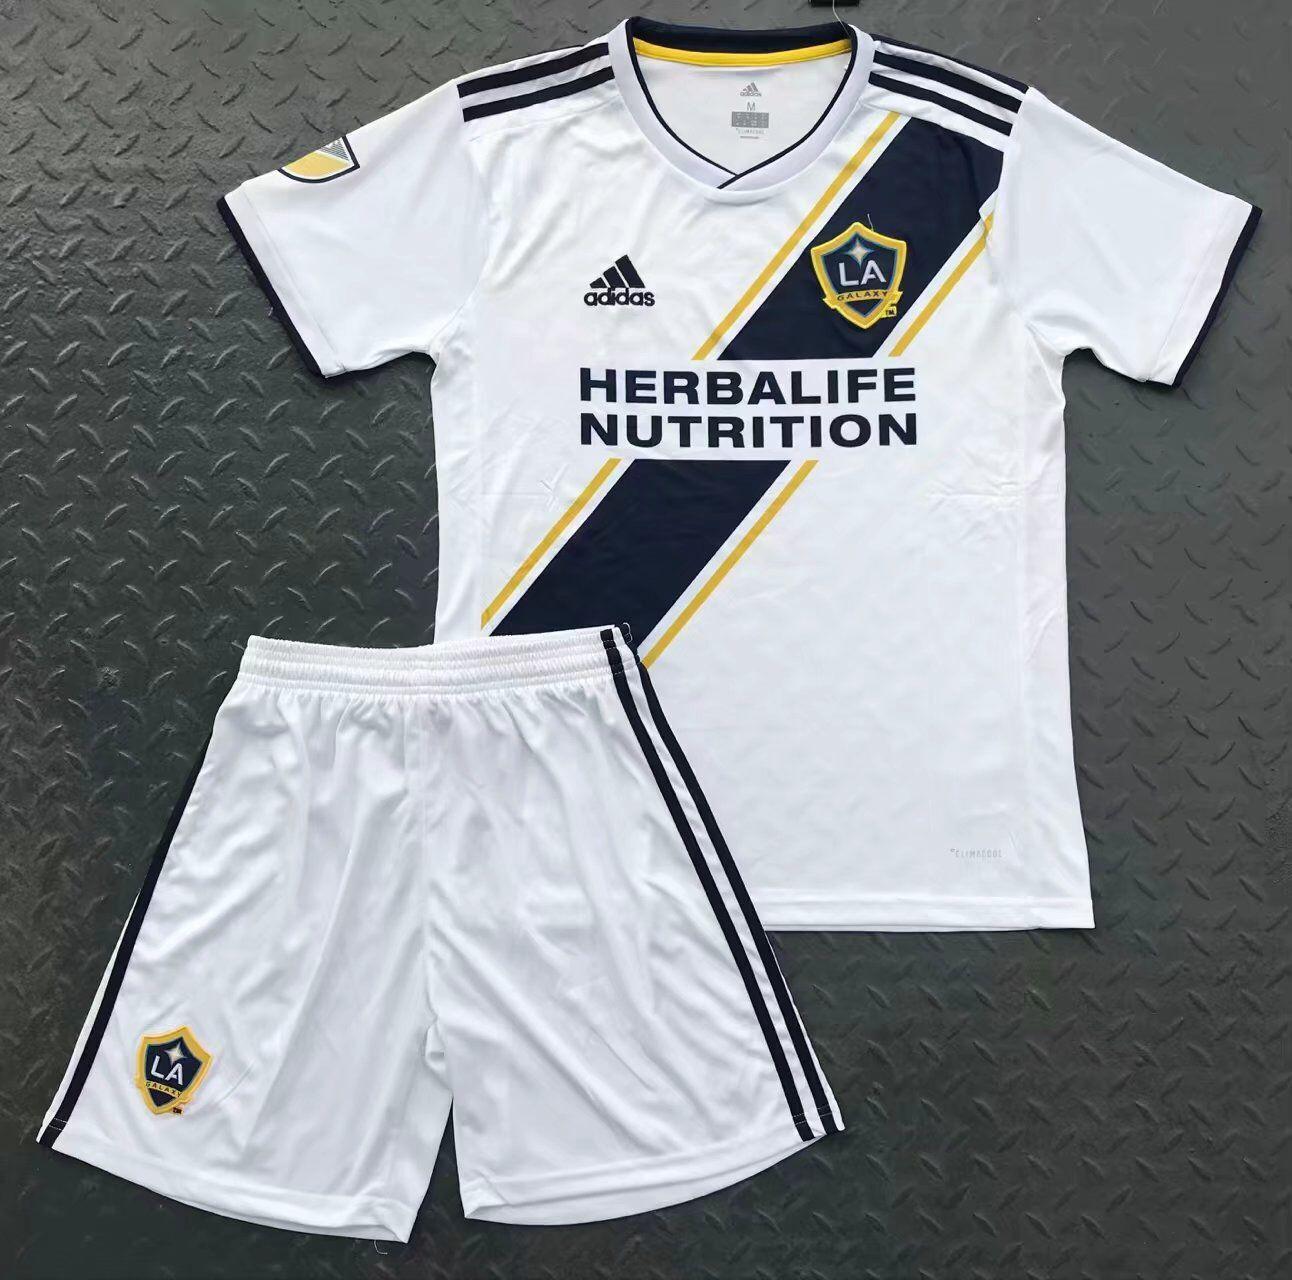 Mls Soccer Jerseys Cheap Adult La Galaxy Home White Uniform 20 Size 18 2019